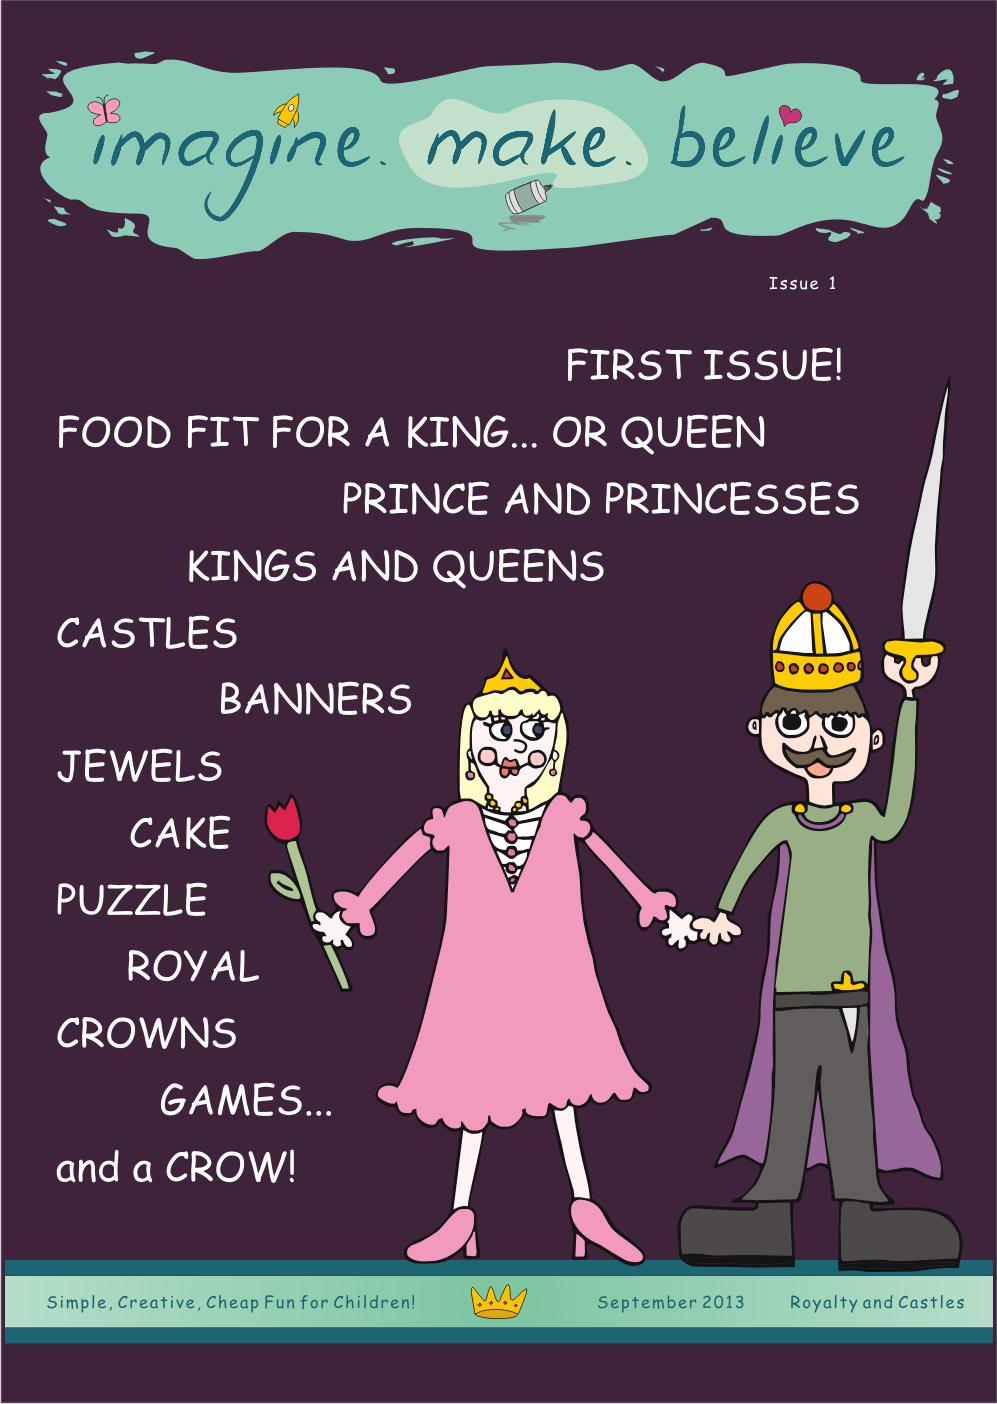 children, kids, magazine, digital, craft, sewing, royal, stitching, holiday, fun, cheap, simple, pattern, tutorial, project